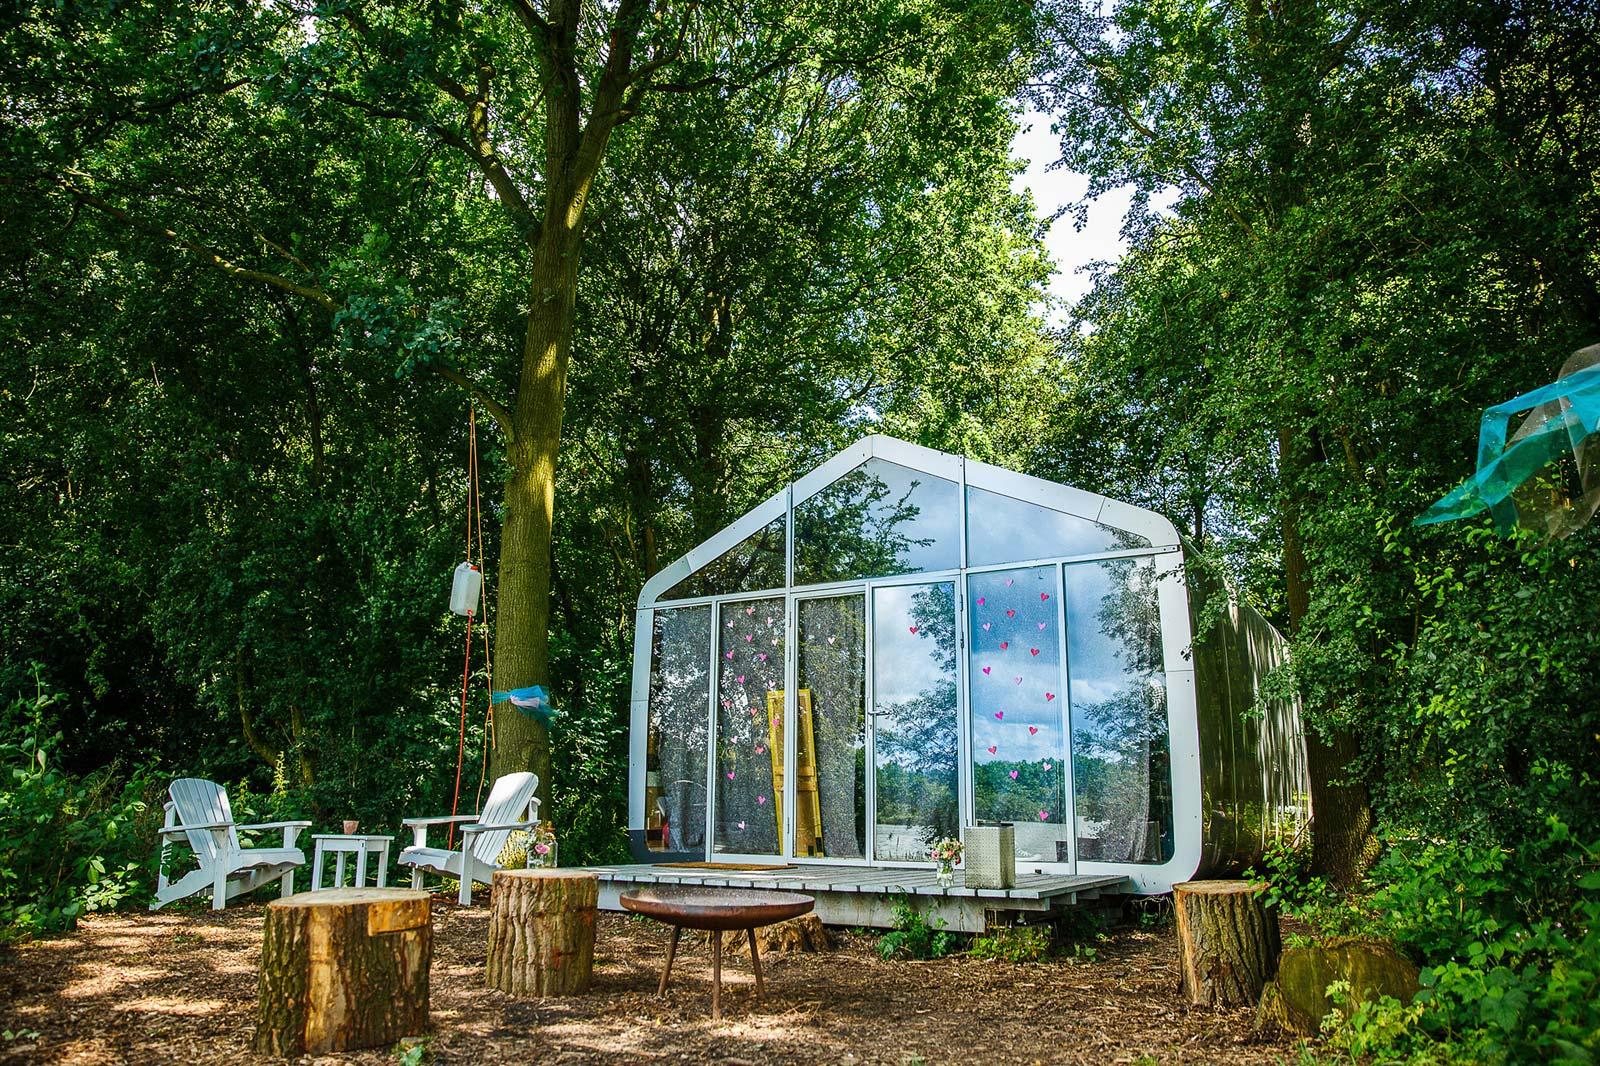 Trouwfotograaf-Camping-Lievelinge-09B